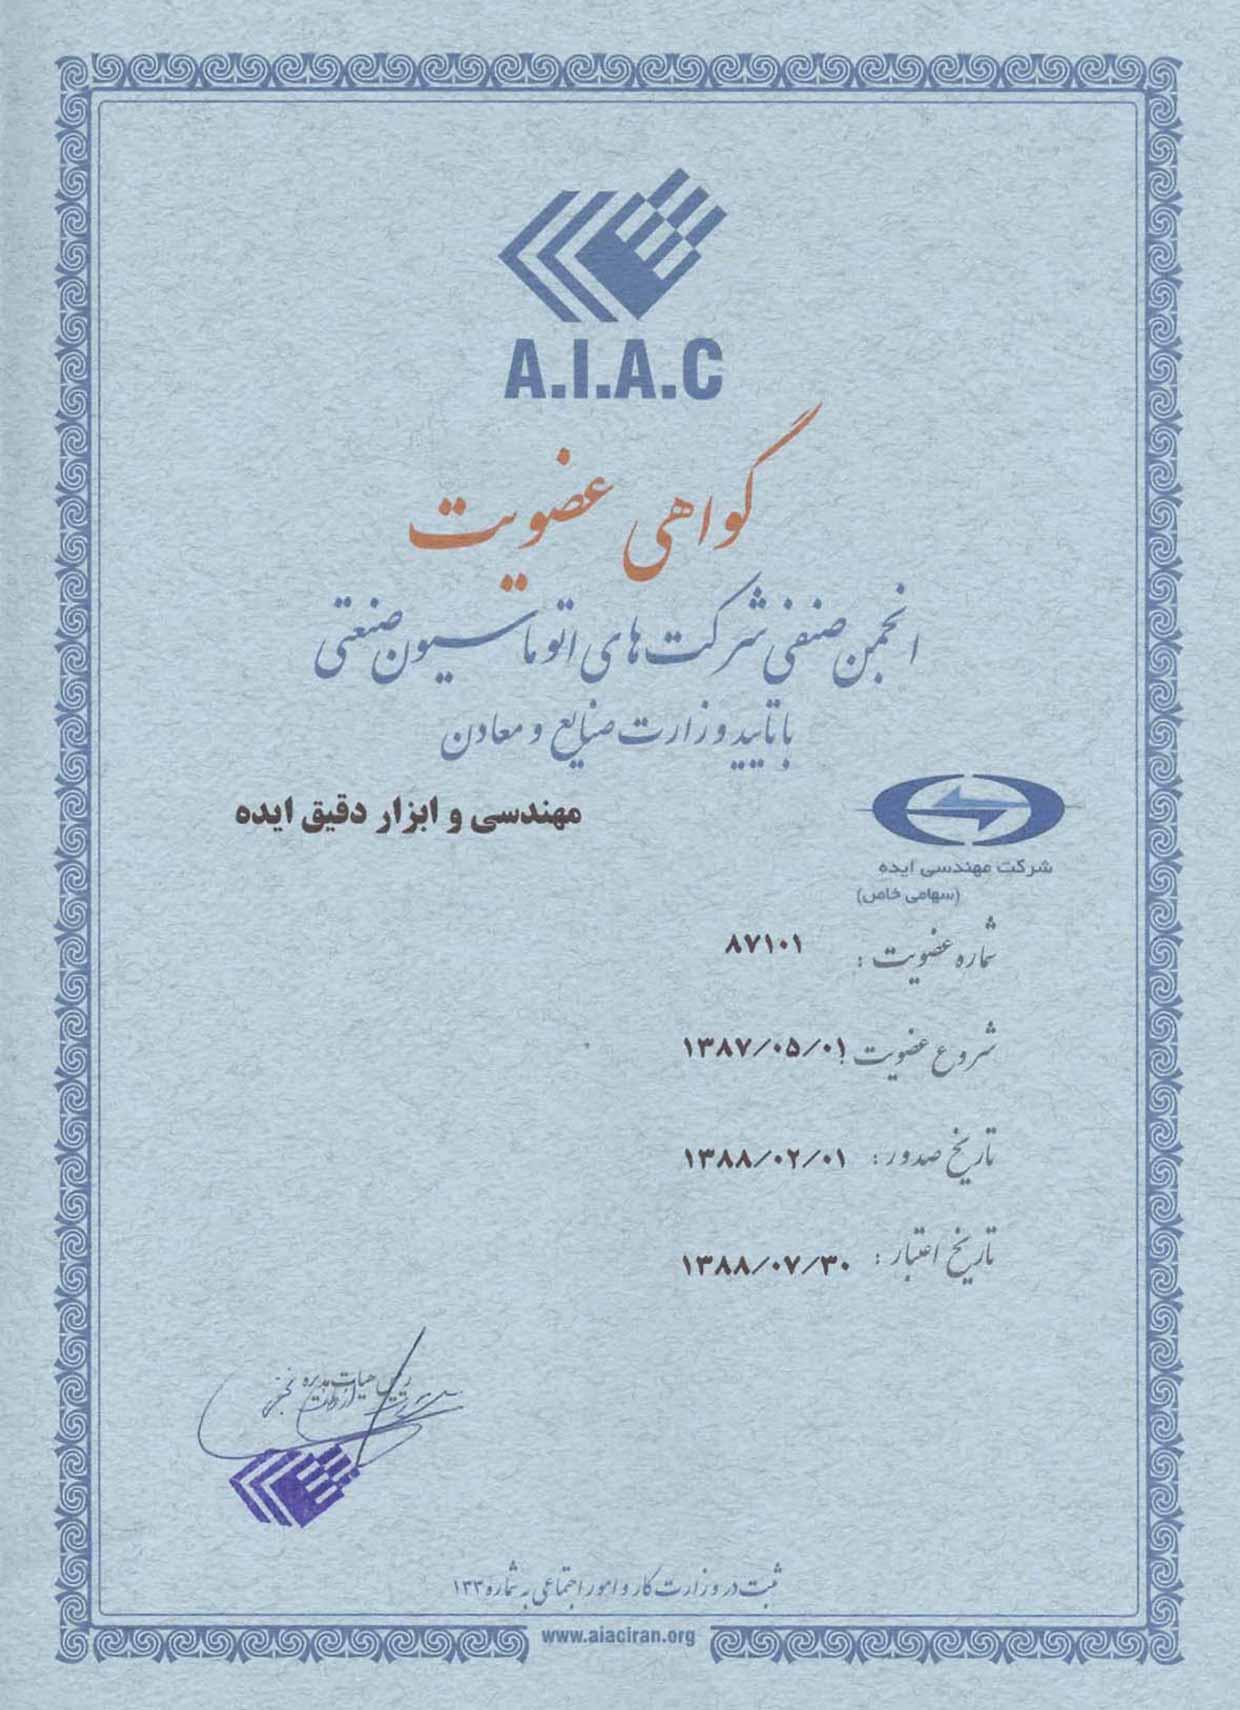 گواهی عضویت انجمن صنعتی اتوماسیون صنعتی فارسی